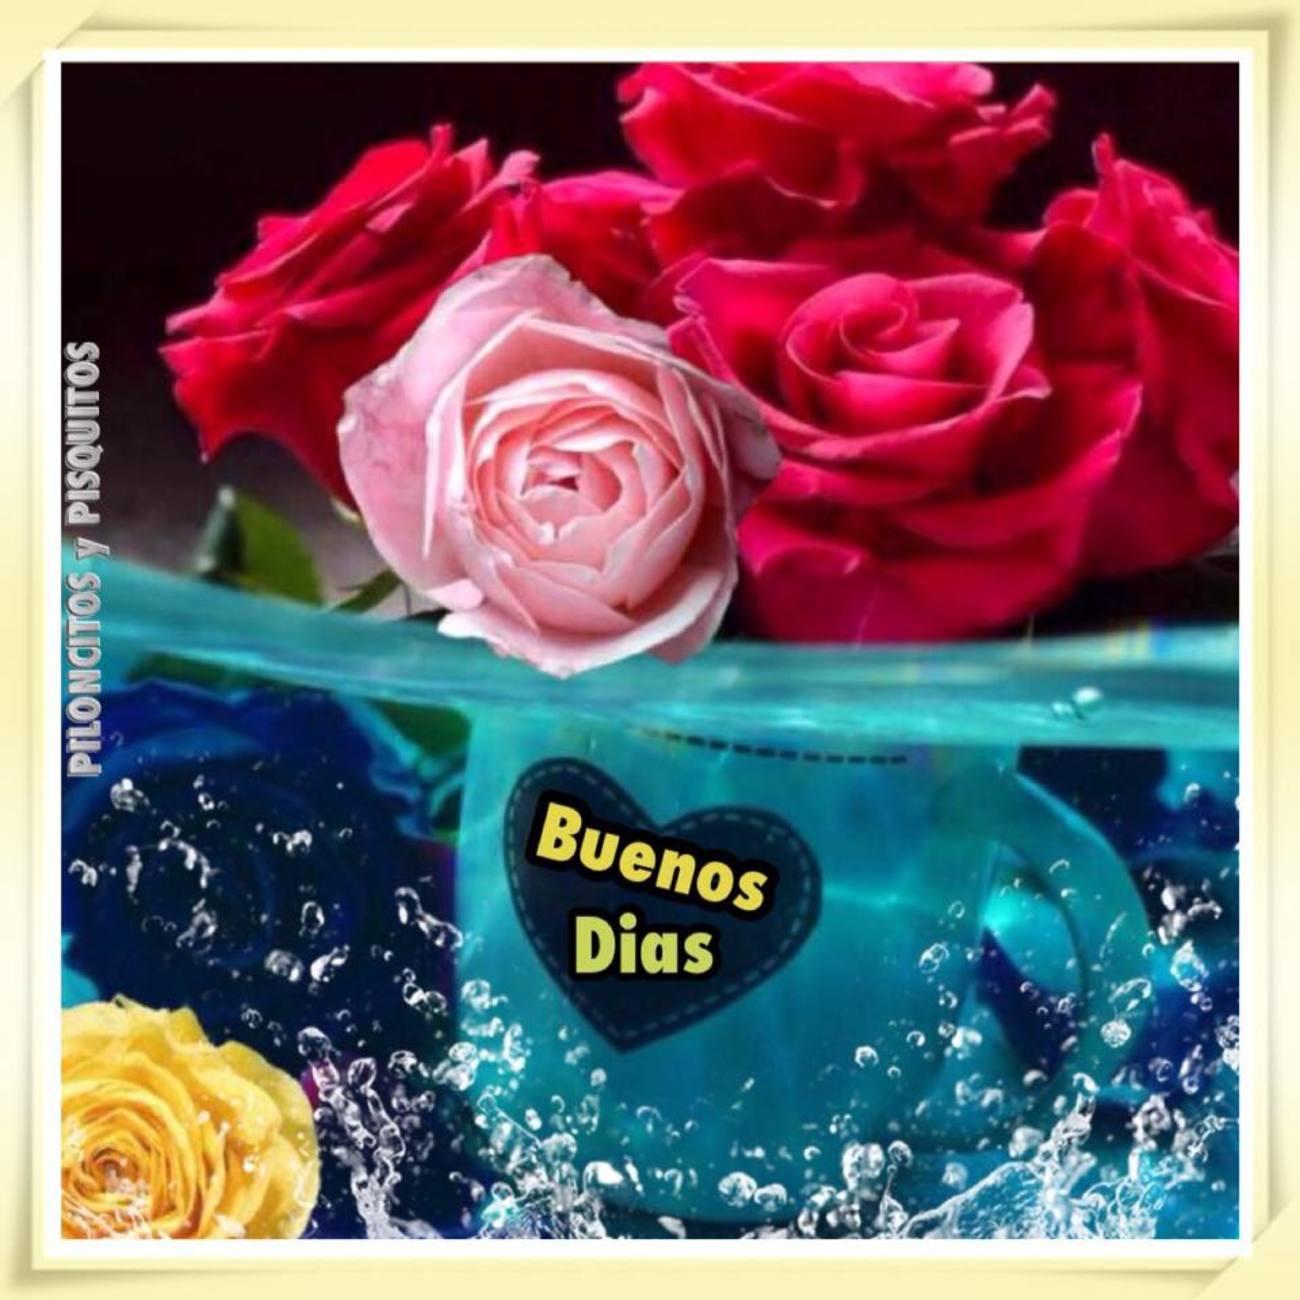 Buenos Días mensajes para Facebook 730